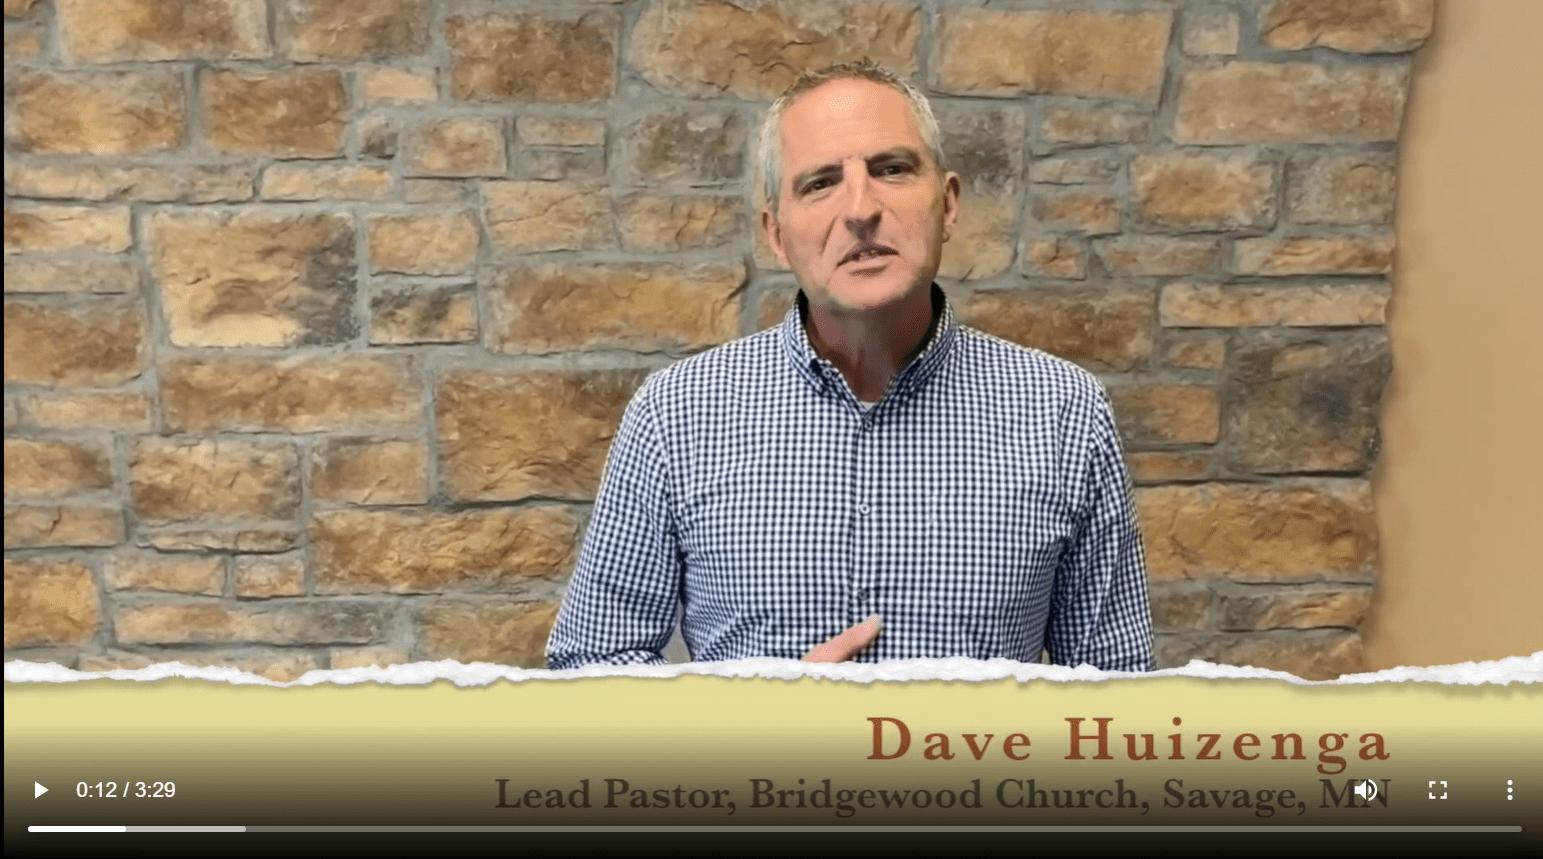 Nehemiah Reset's Mission